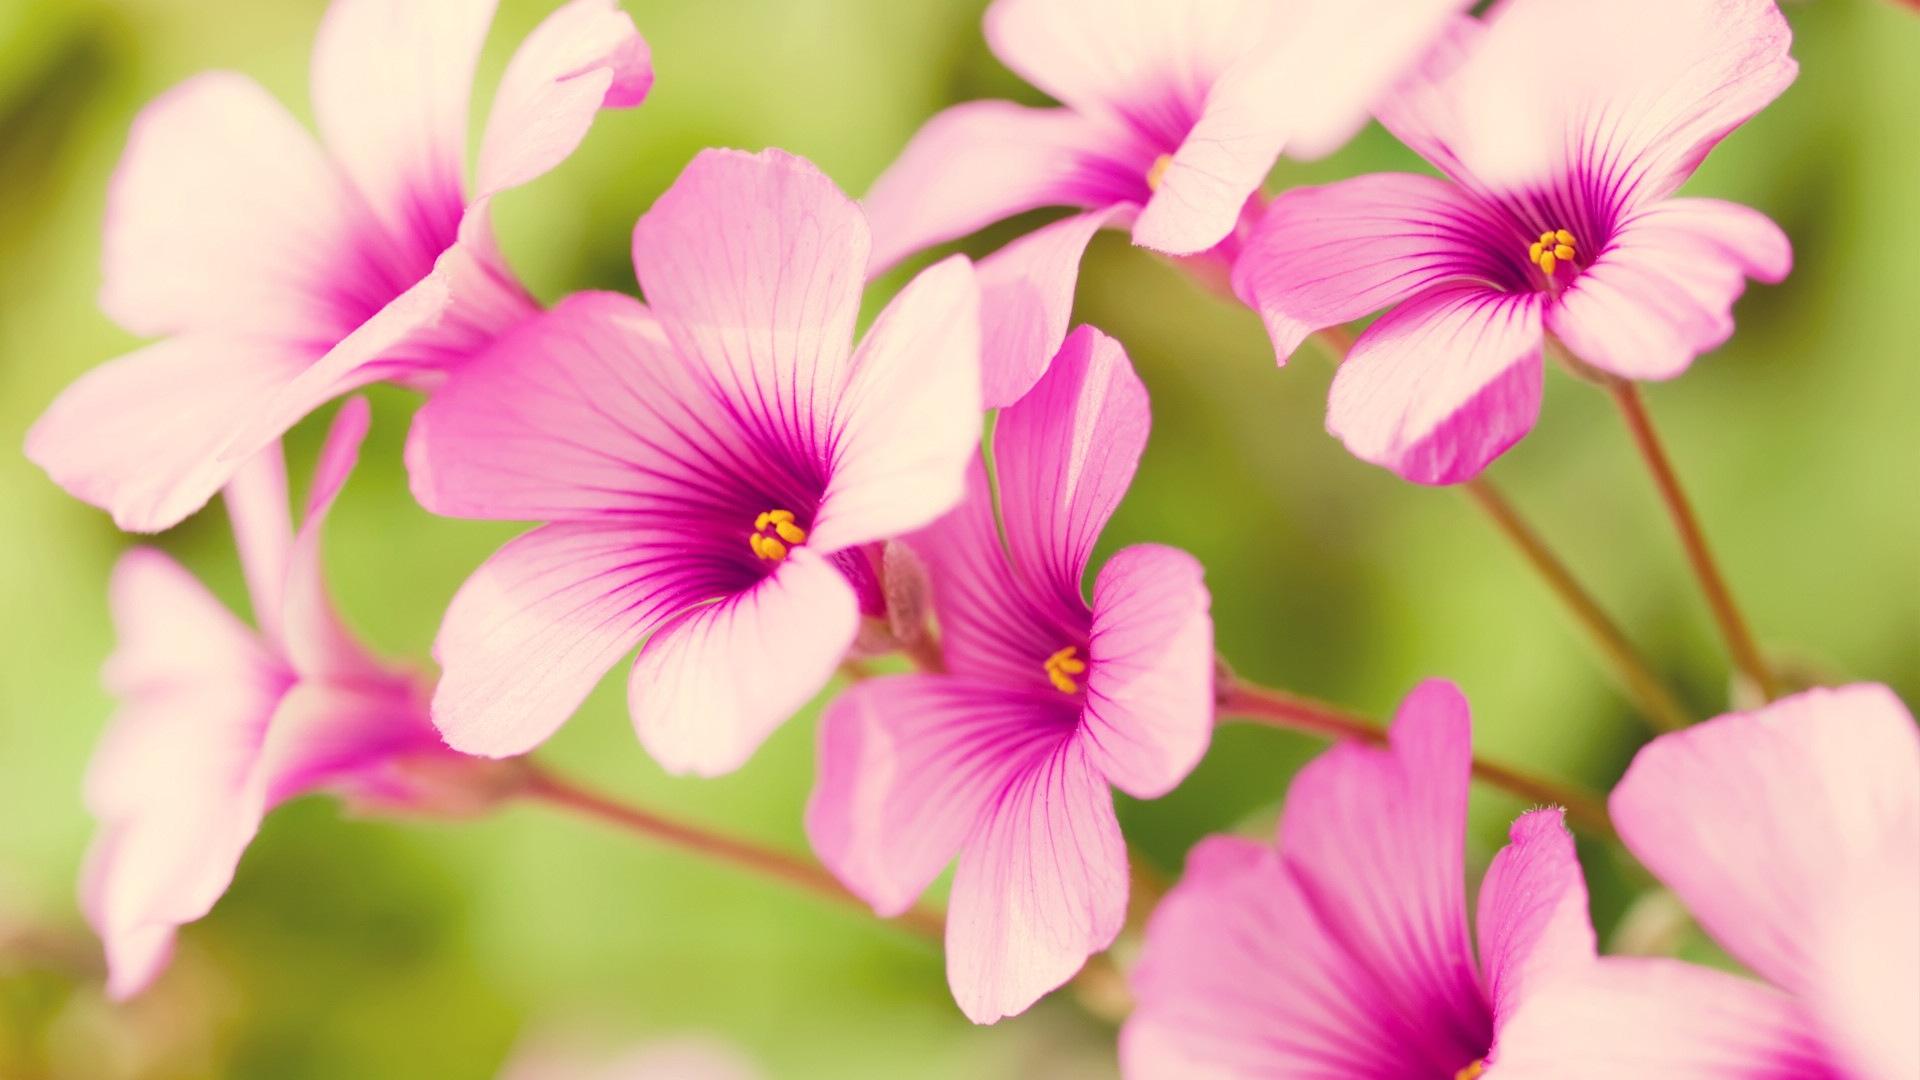 Spring Flower wallpaper   702489 1920x1080